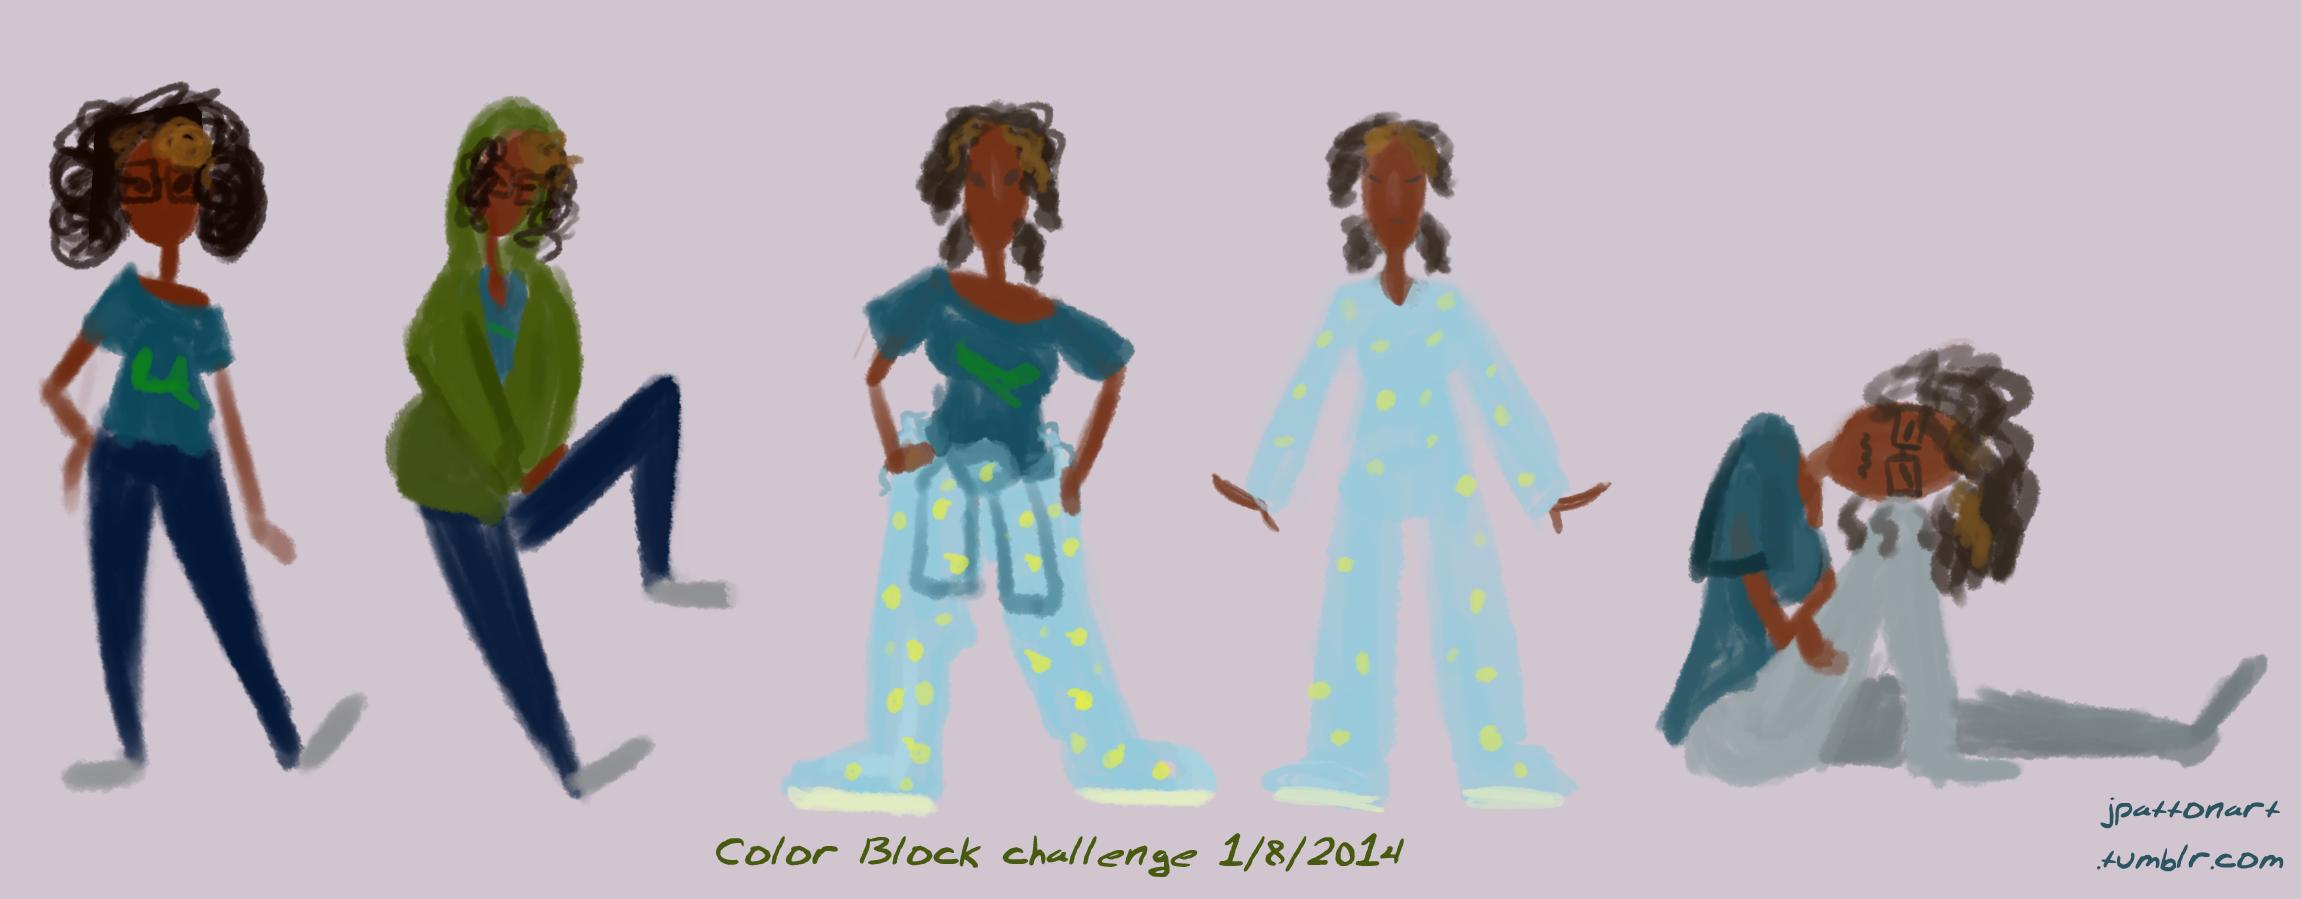 color-blocking-challenge.png